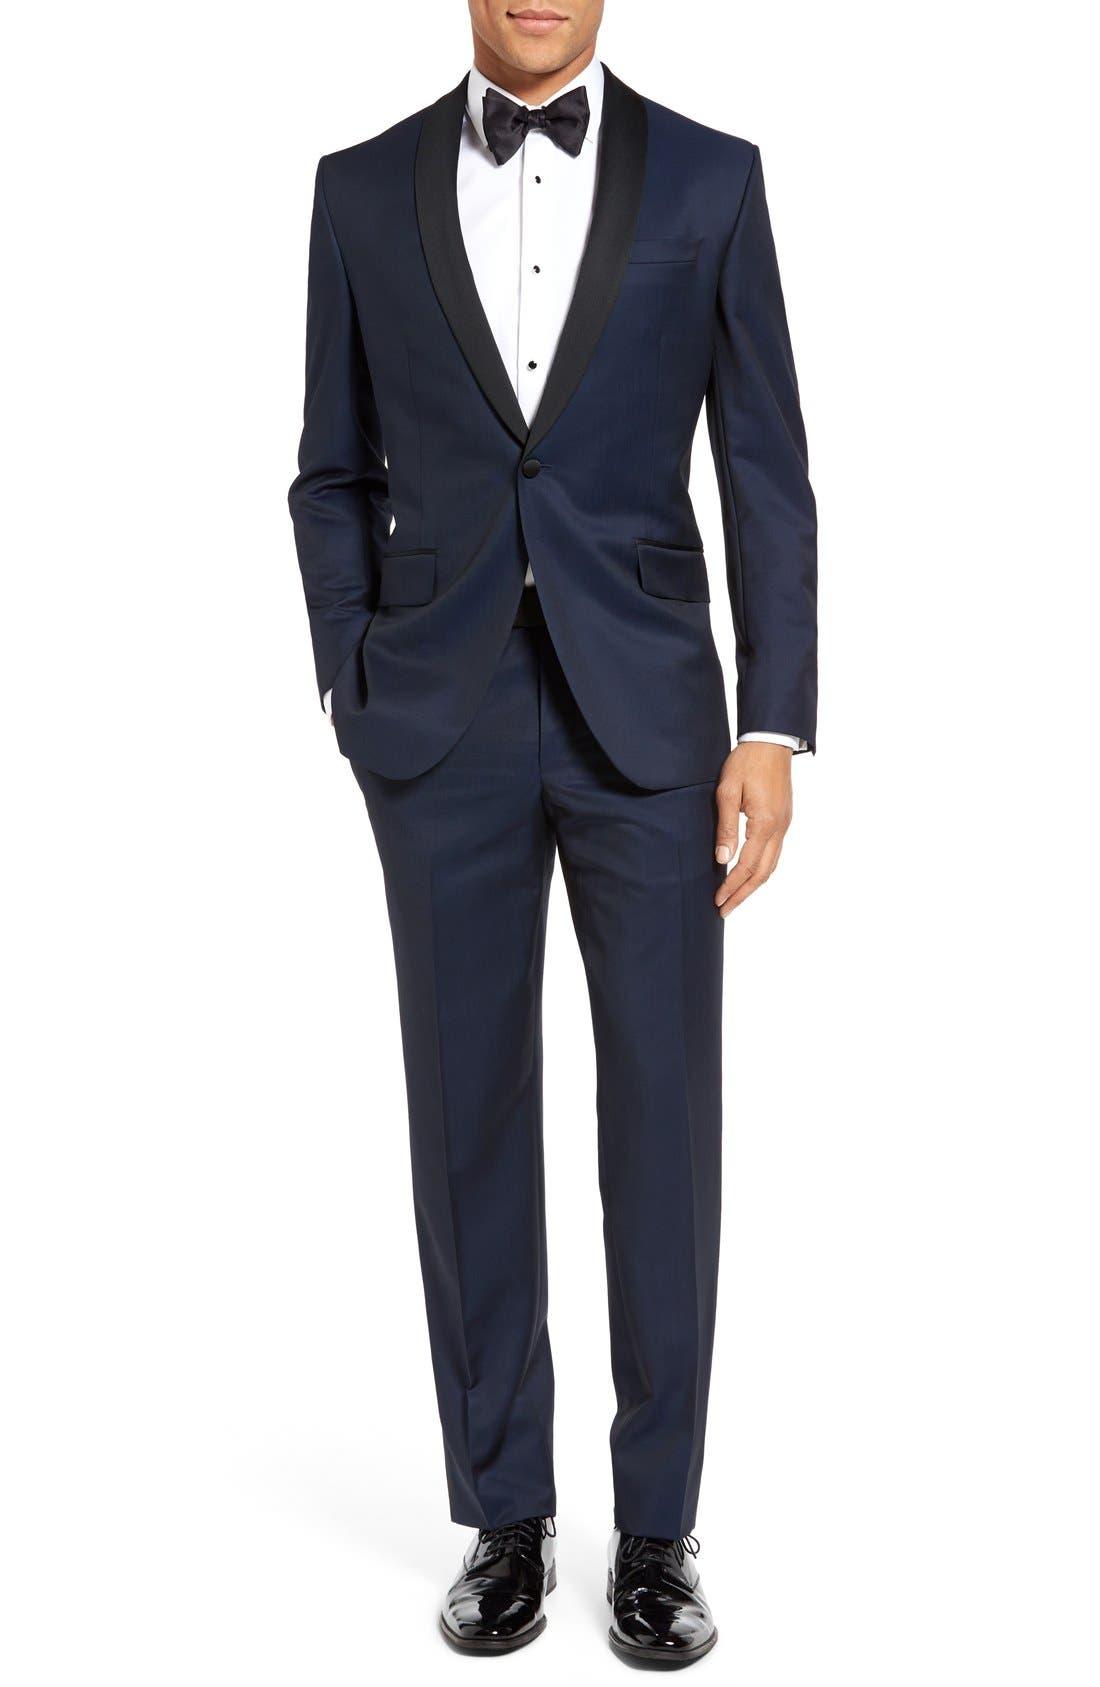 'Josh' Trim Fit Navy Shawl Lapel Tuxedo,                             Main thumbnail 1, color,                             NAVY BLUE